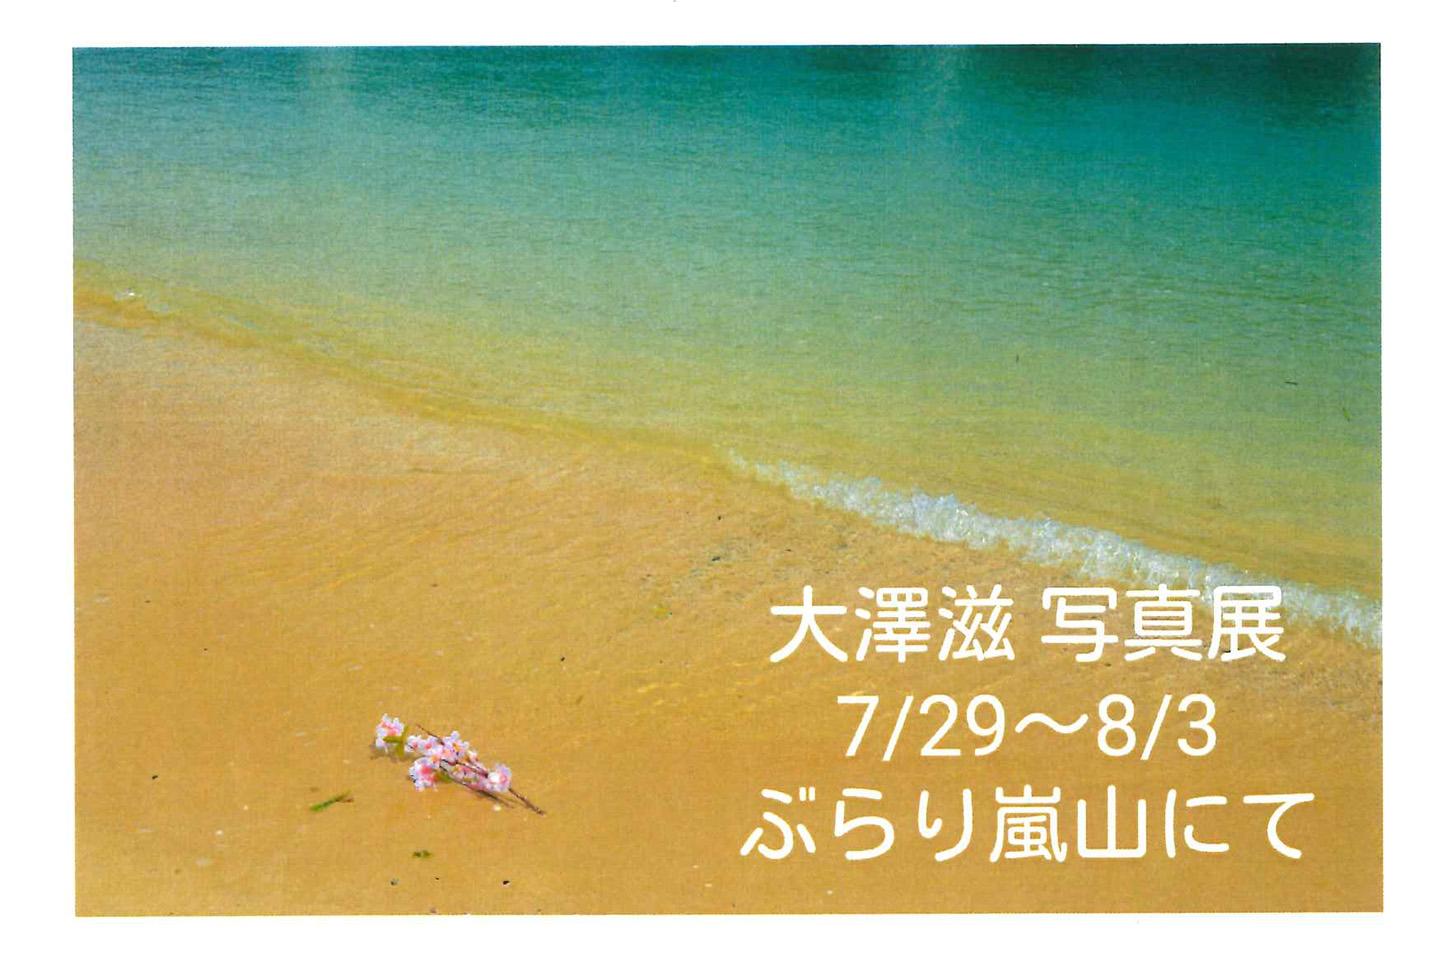 大澤滋 写真展 エピソードⅢ(会期延長)